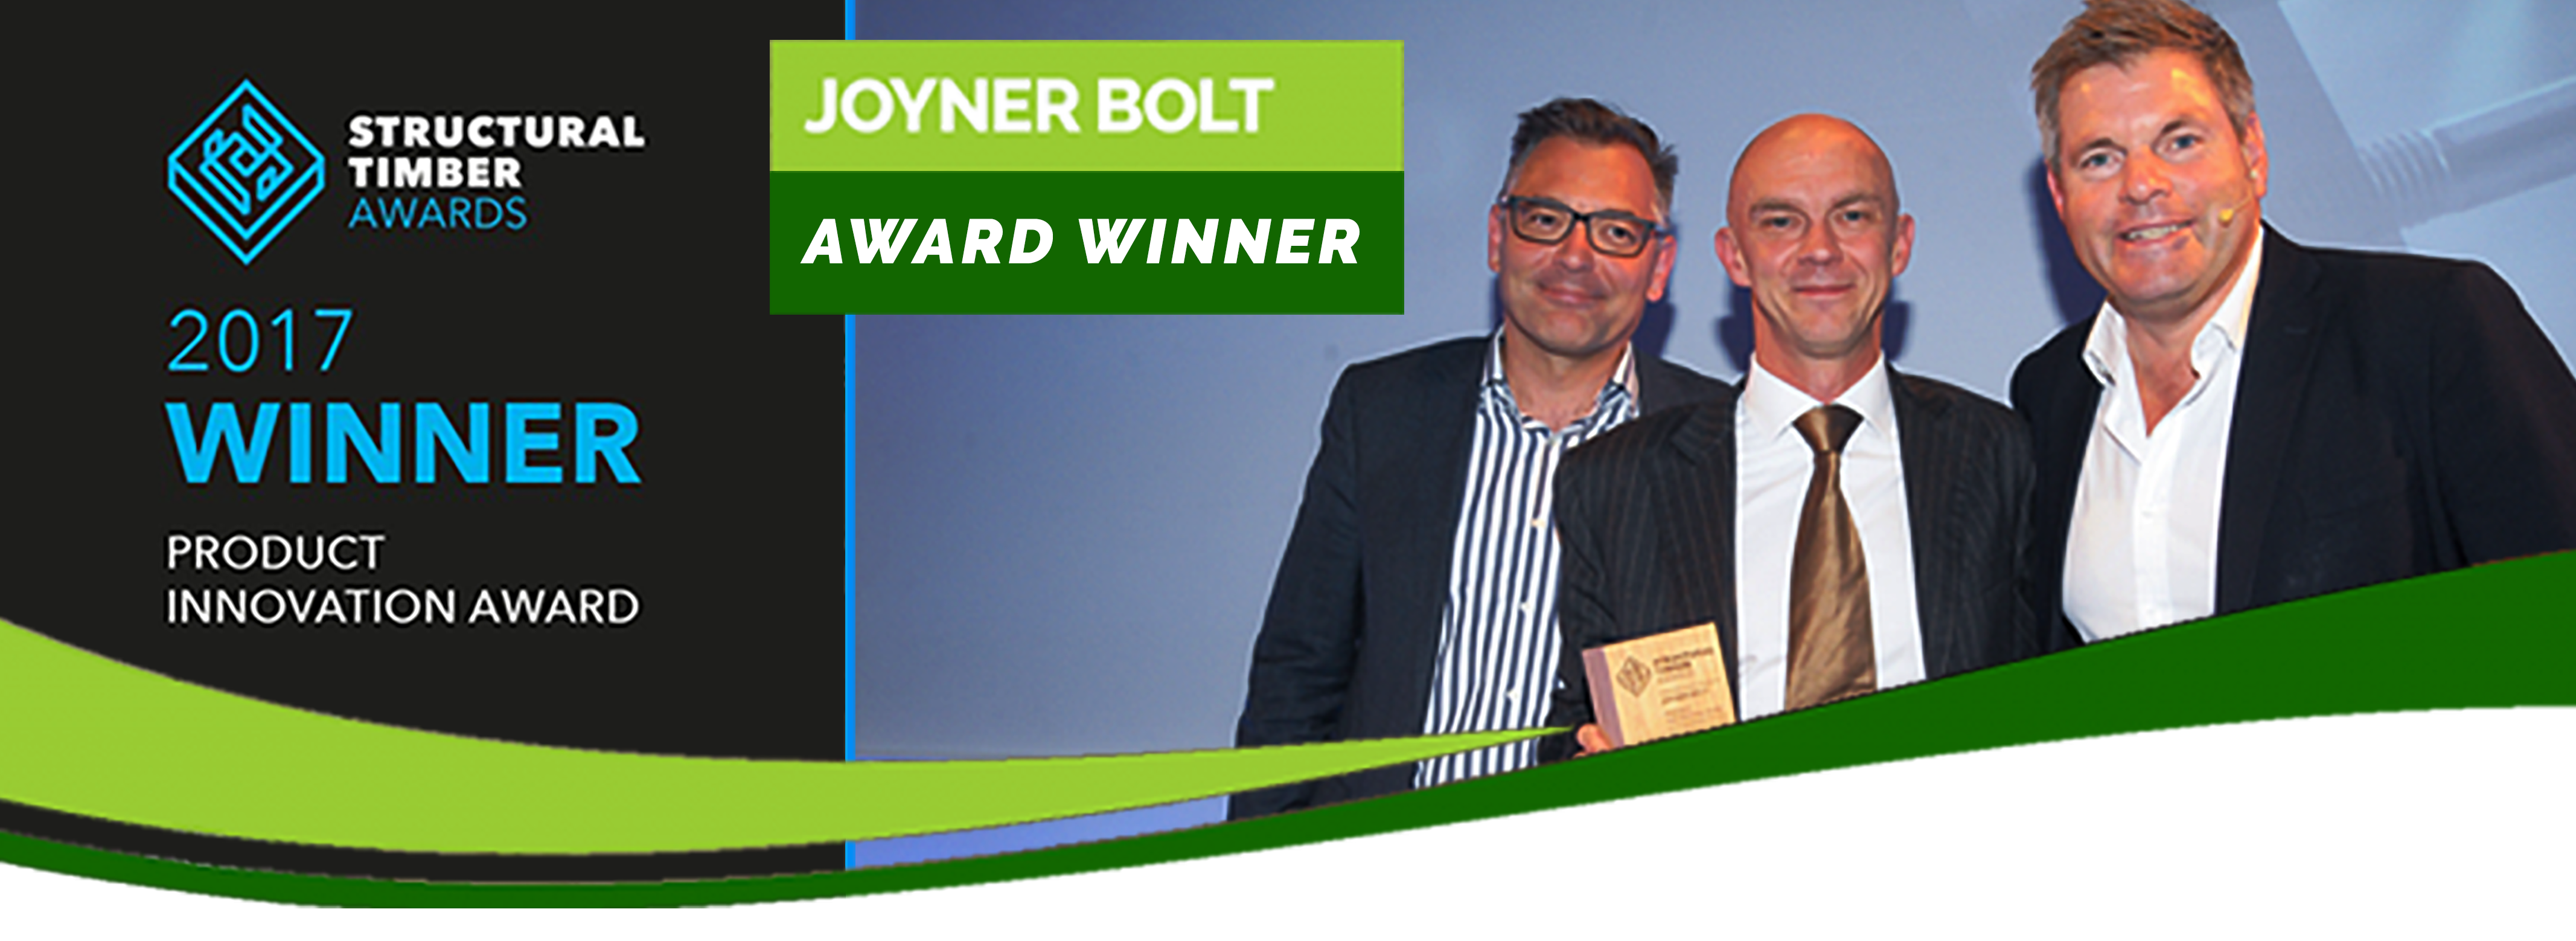 joyner bolt coach bolt alternative award